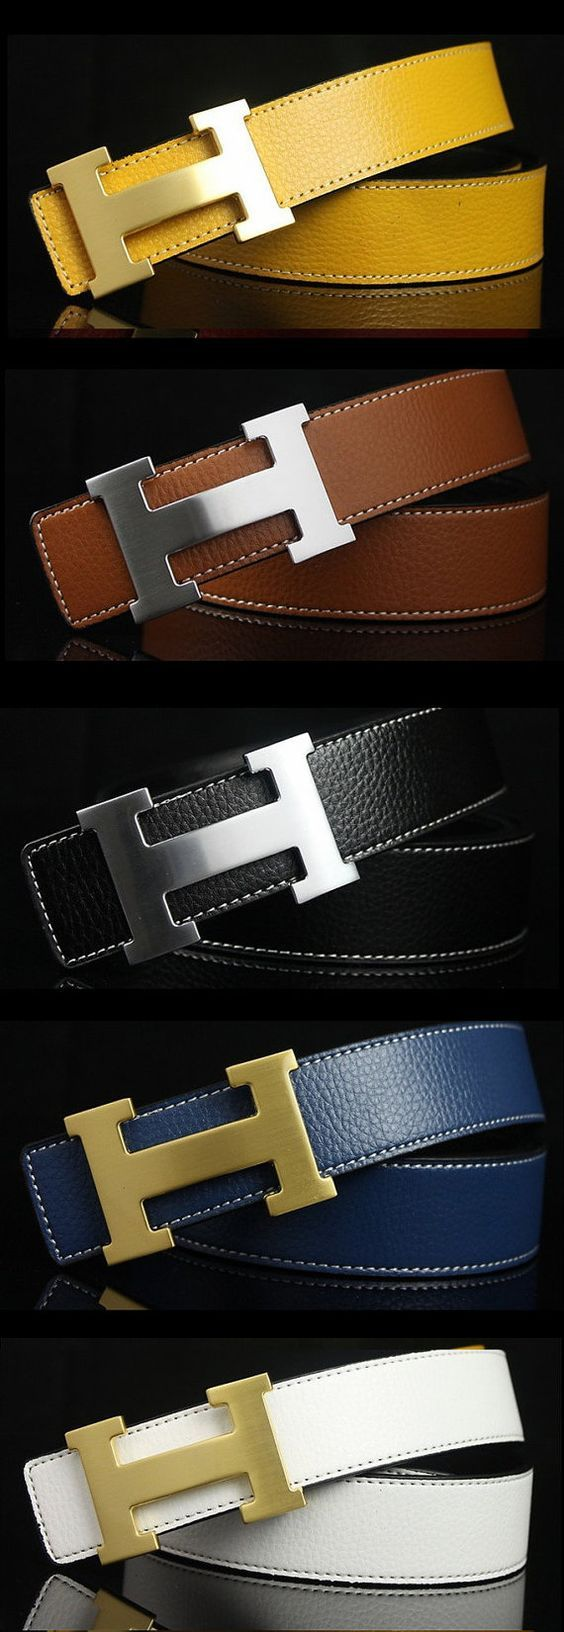 Hermes H Belt - Designer Authentication Services for Handbags, Shoes, Fine Jewelry & Accessories | Luxury Designer Authentication